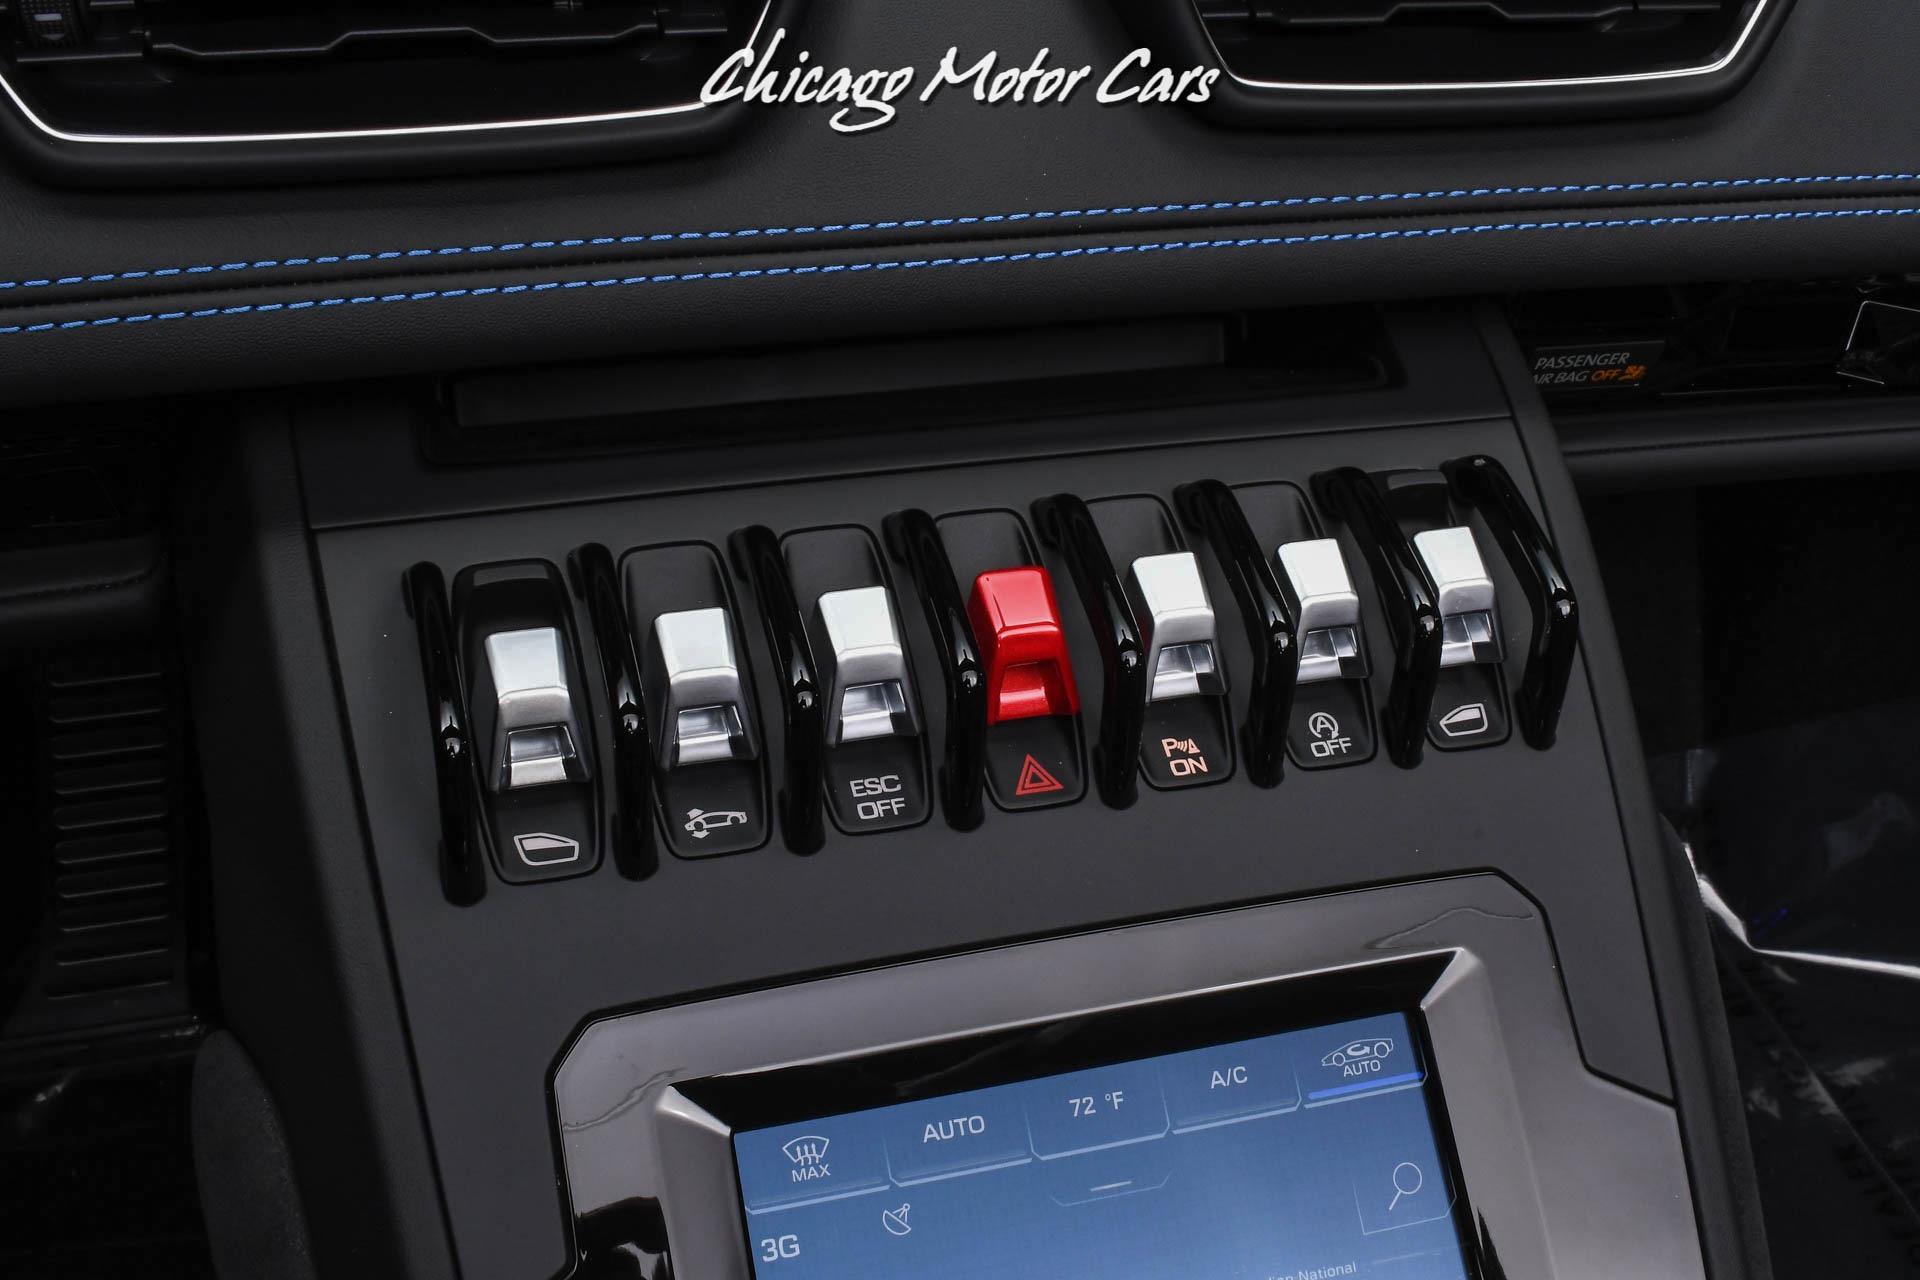 Used-2021-Lamborghini-Huracan-EVO-Spyder-Stunning-Blu-Sideris-Paint-Q-Citura-Stitching-468-Miles